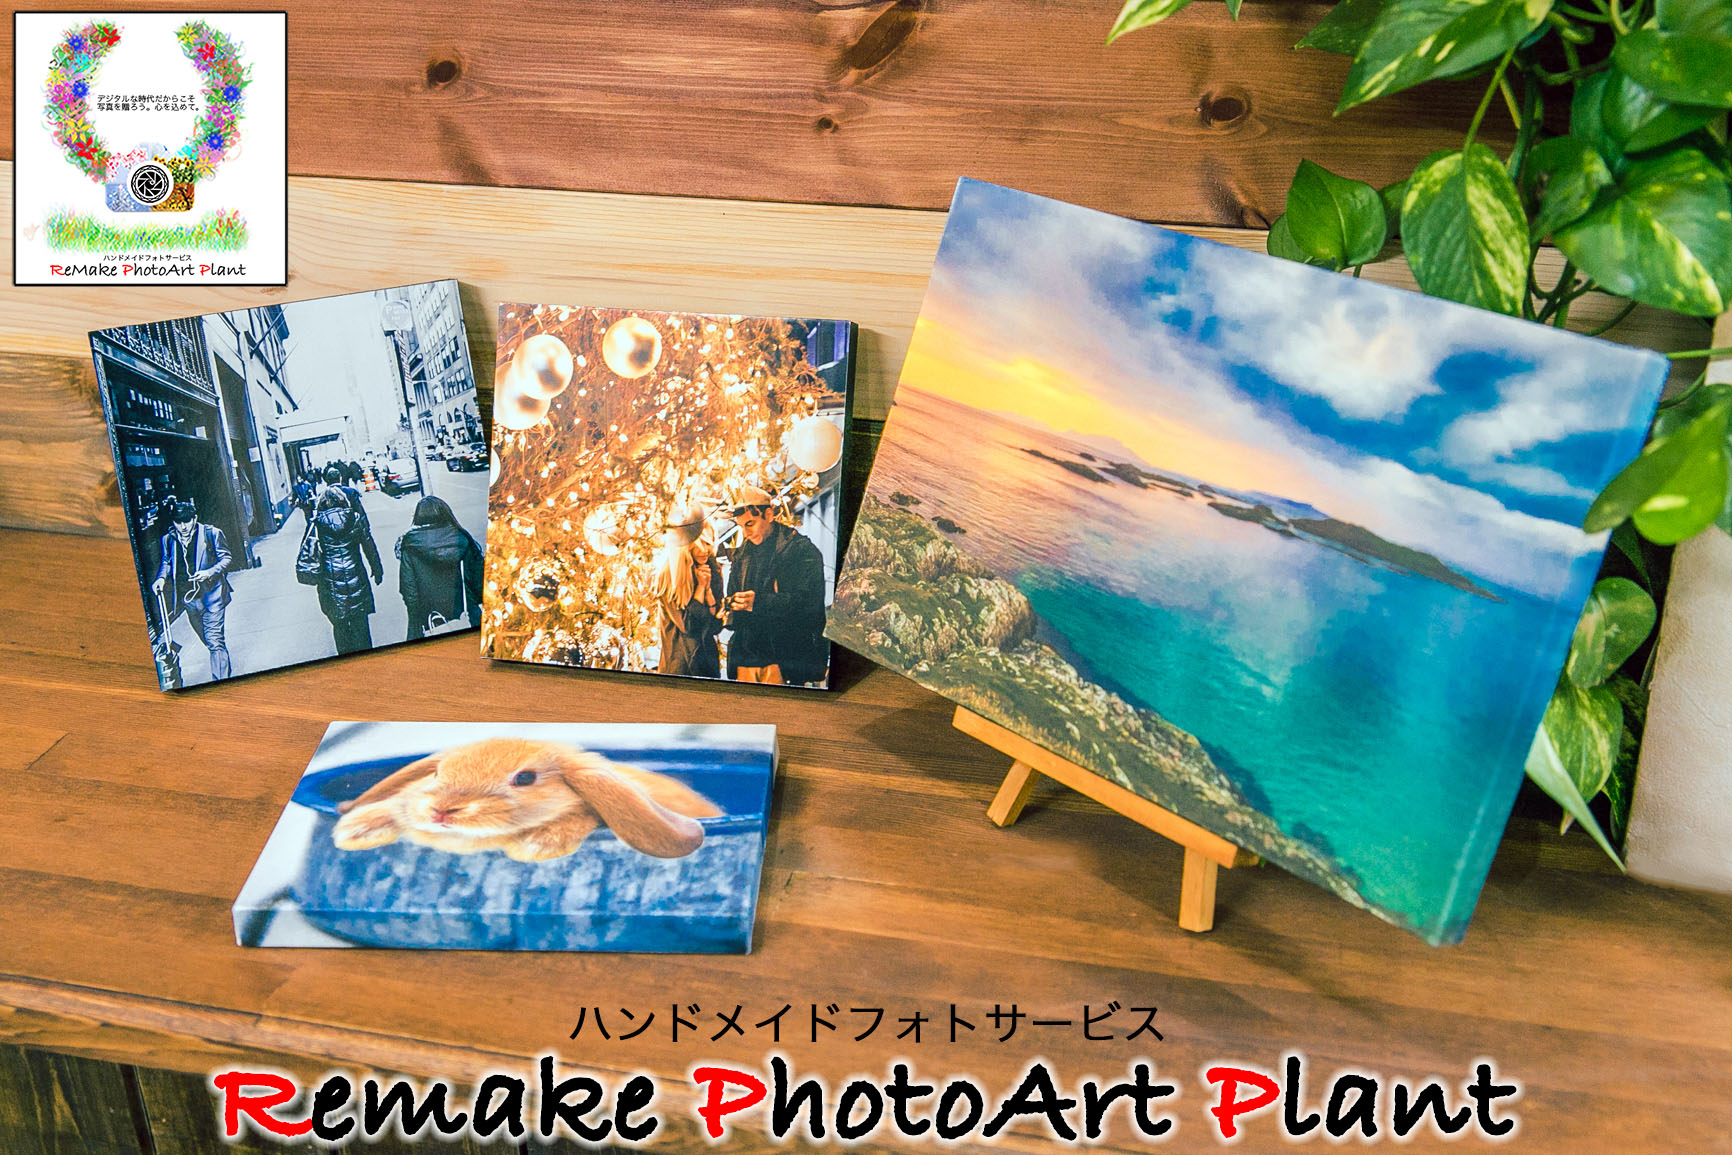 Remake PhotoArt Plant